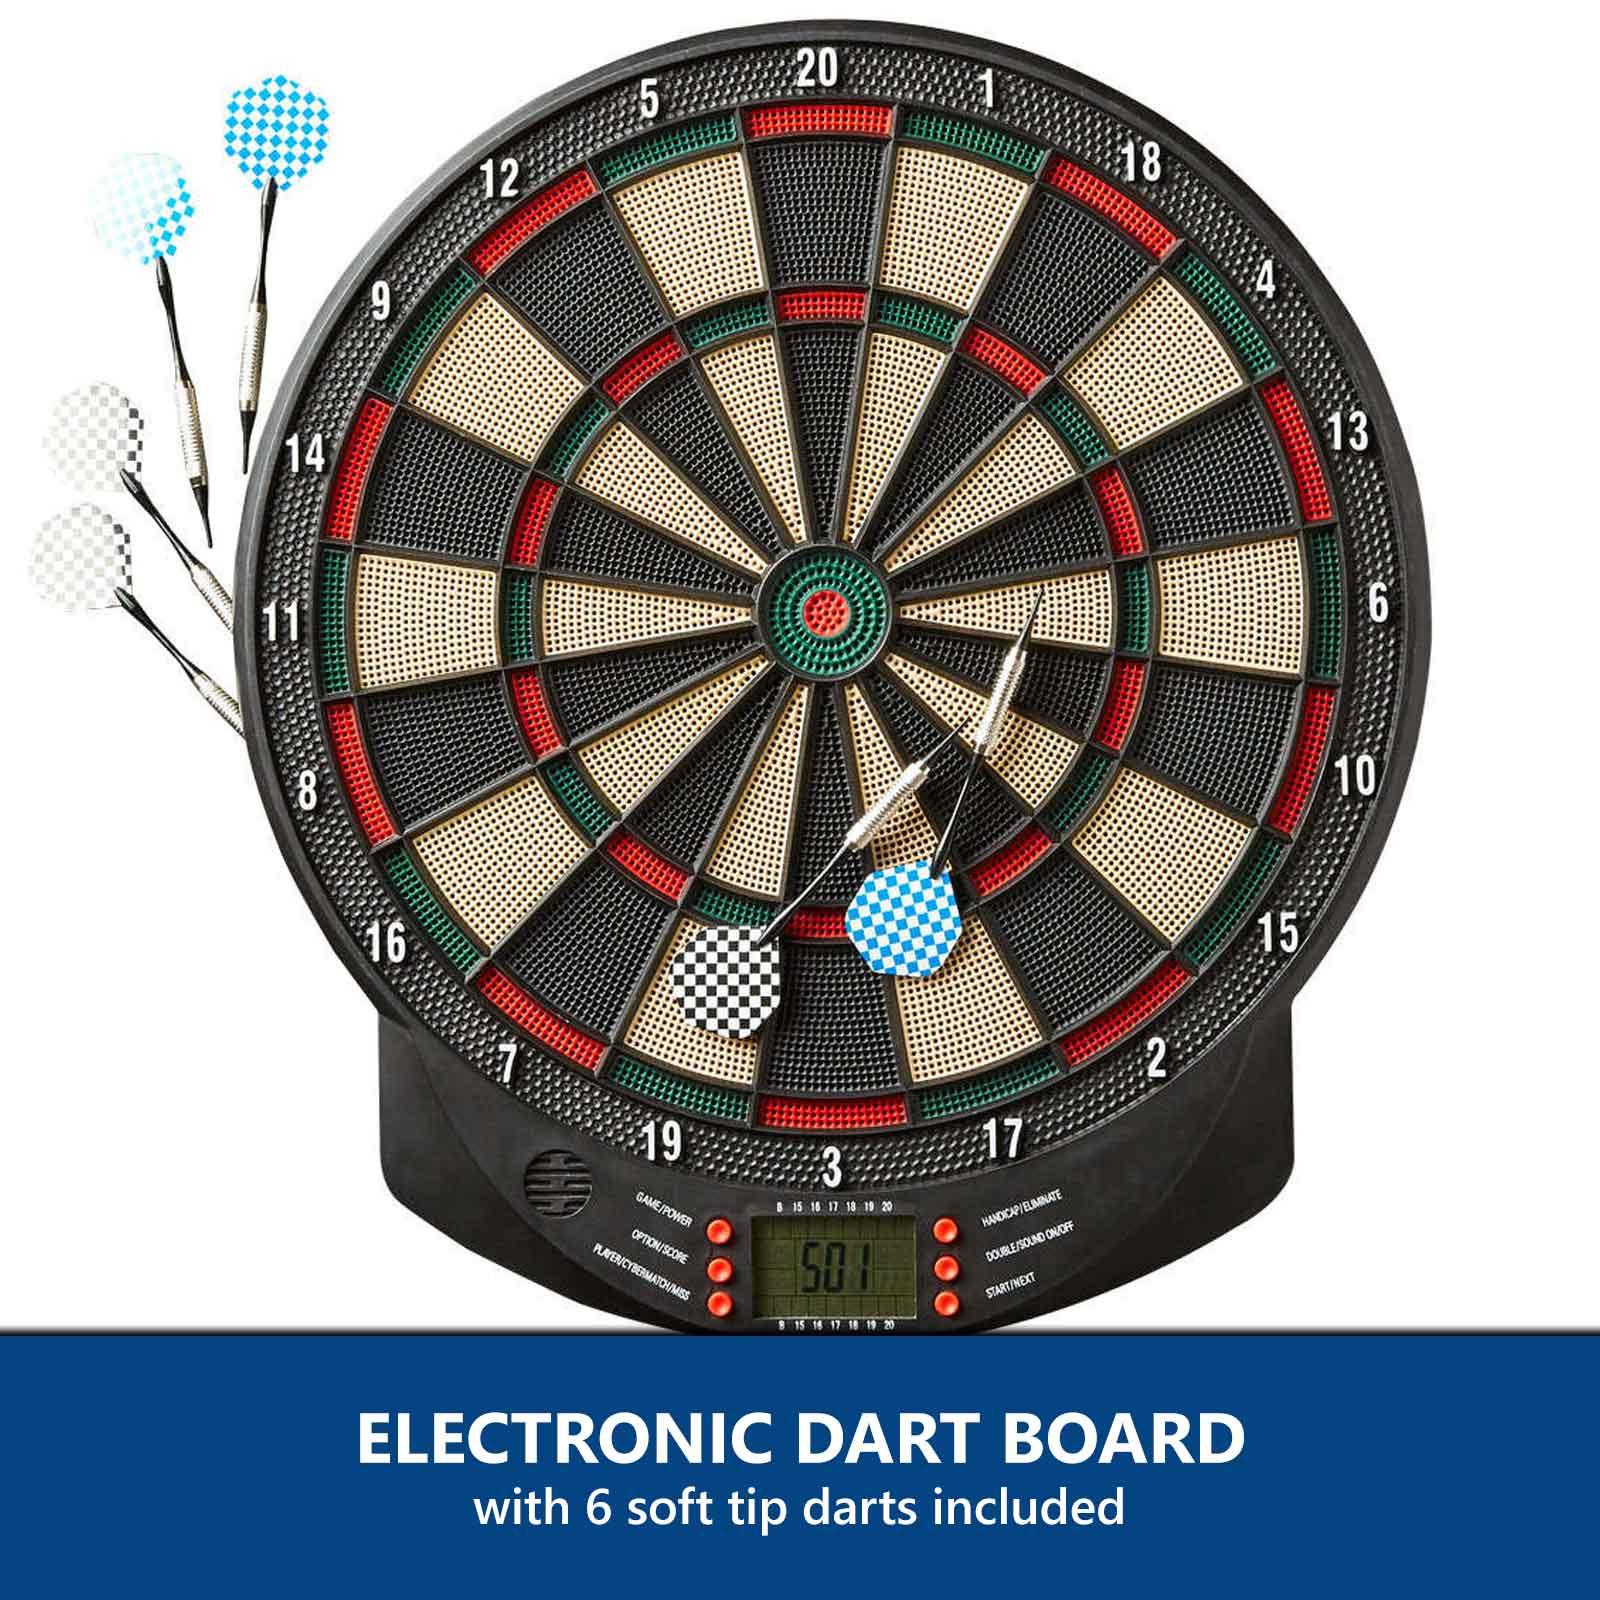 Electronic Dart Board Pro 6 Soft Tip Darts LED Digital Scoring Display Dartboard  eBay